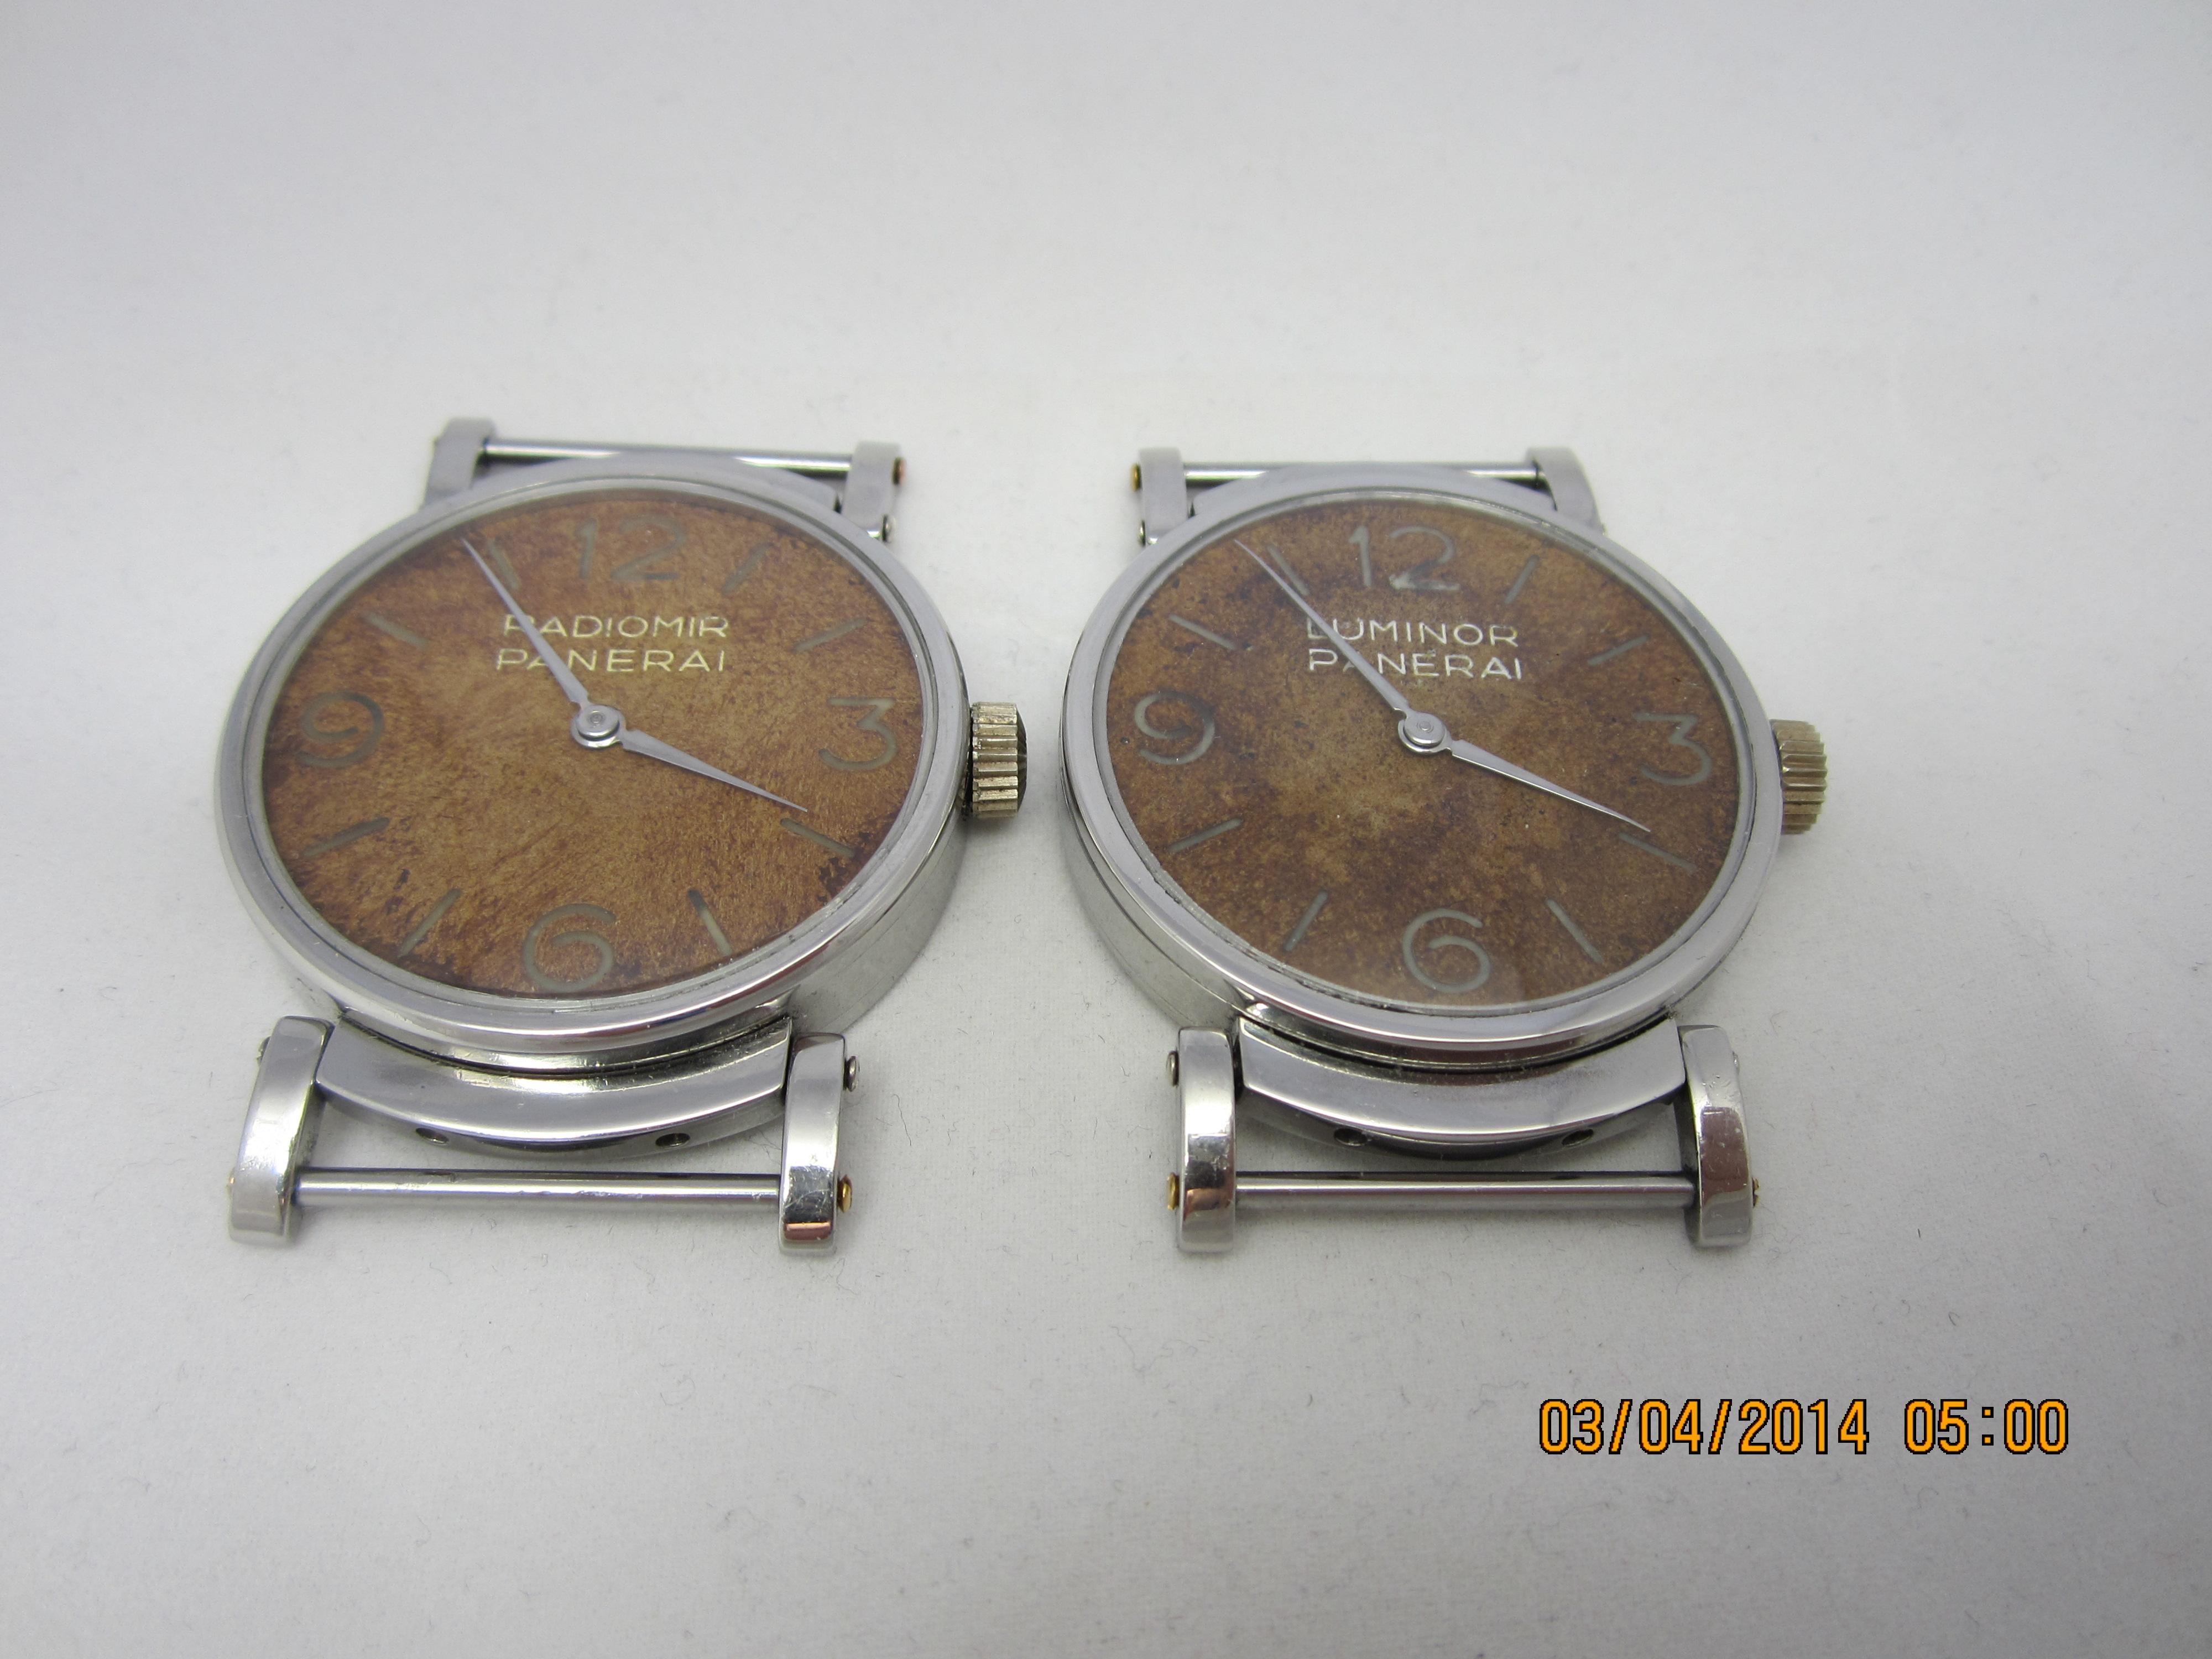 Panerai Pocket Watch in Watchcircle custom Case